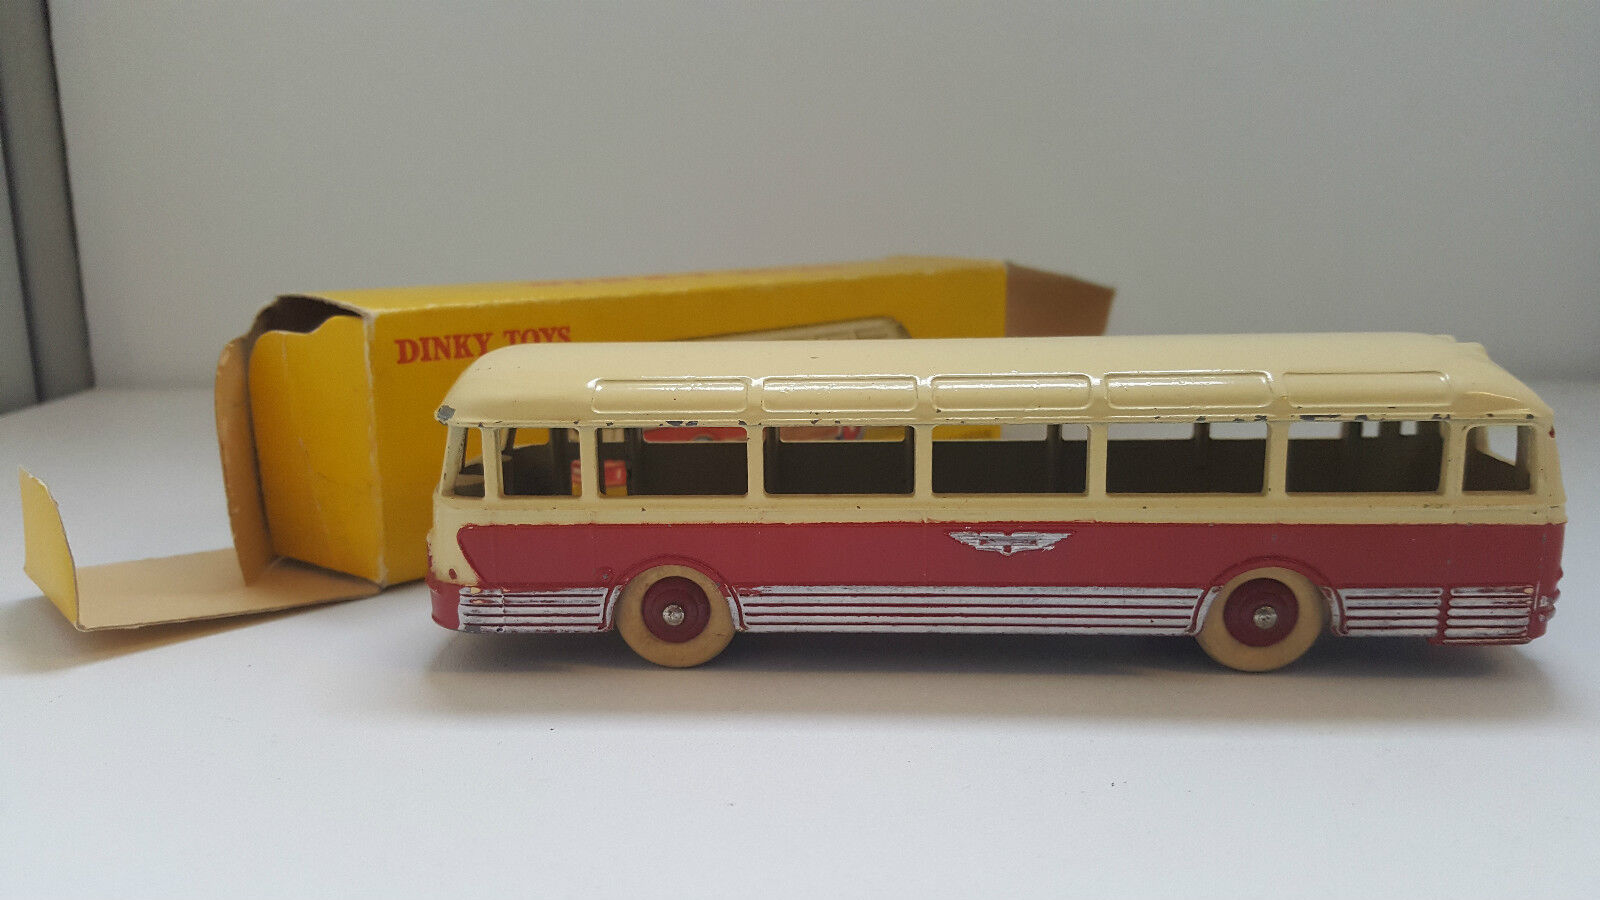 Dinky toys - 29 f-autocar chausson rot cream in original box vn mib